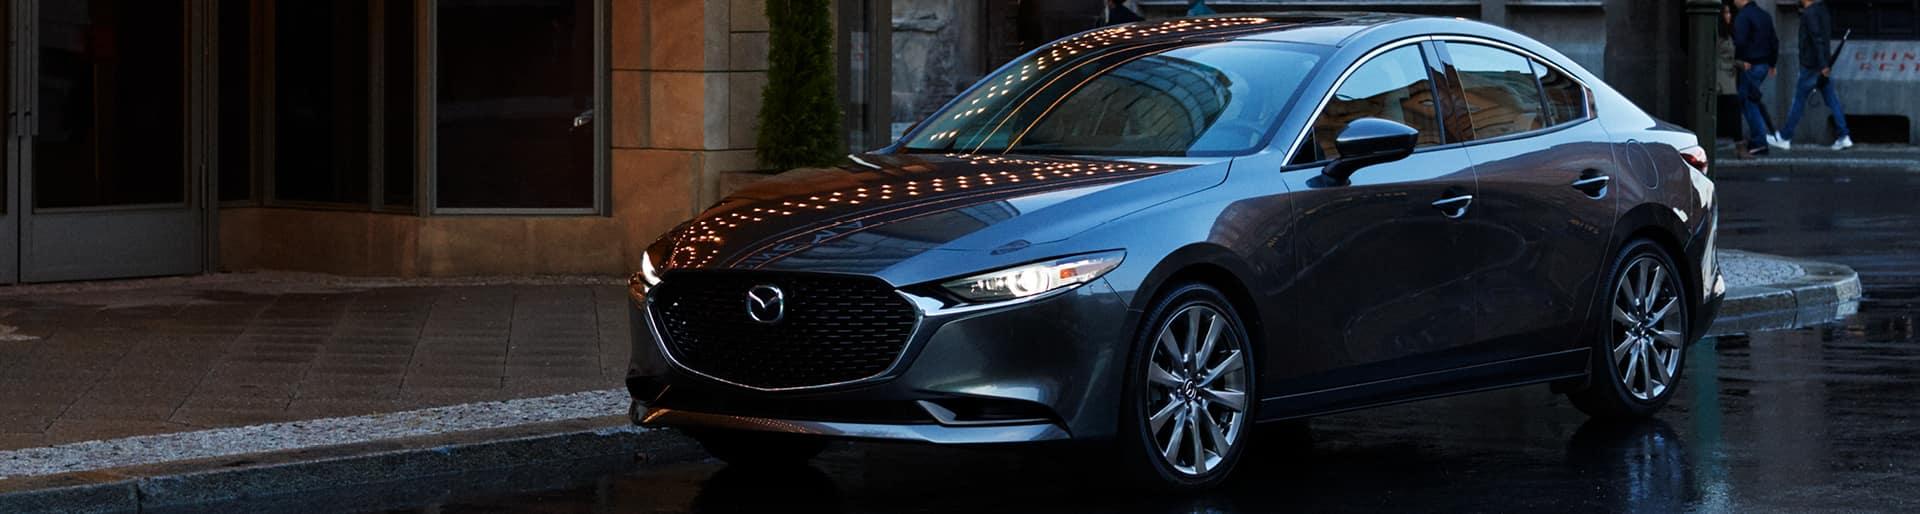 2019 Mazda3 exterior.